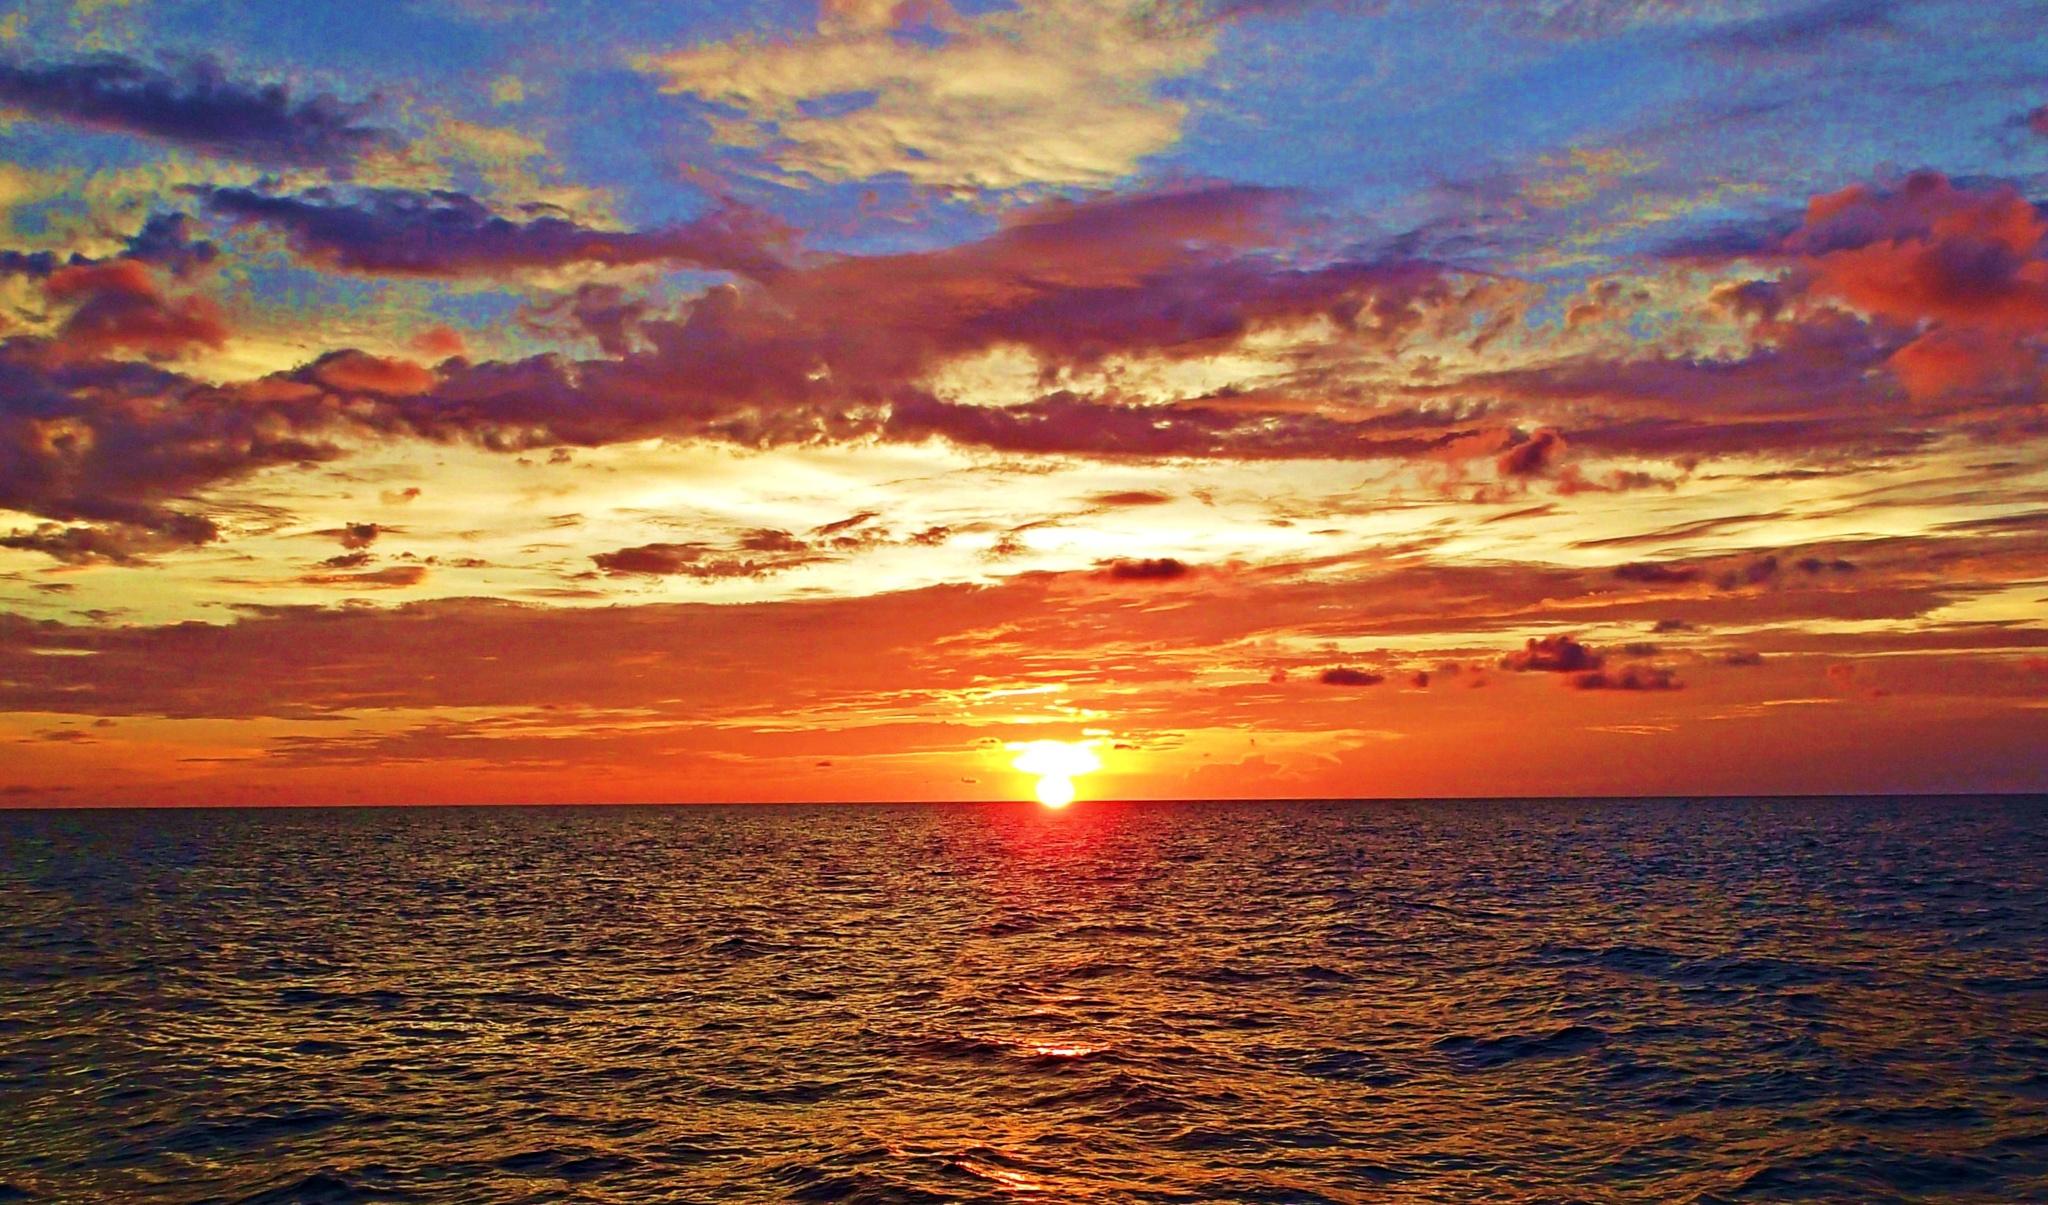 Sunset aboard the Juliet, lost in the Bahamas by Robert Hopkins (Hop) Ridgell